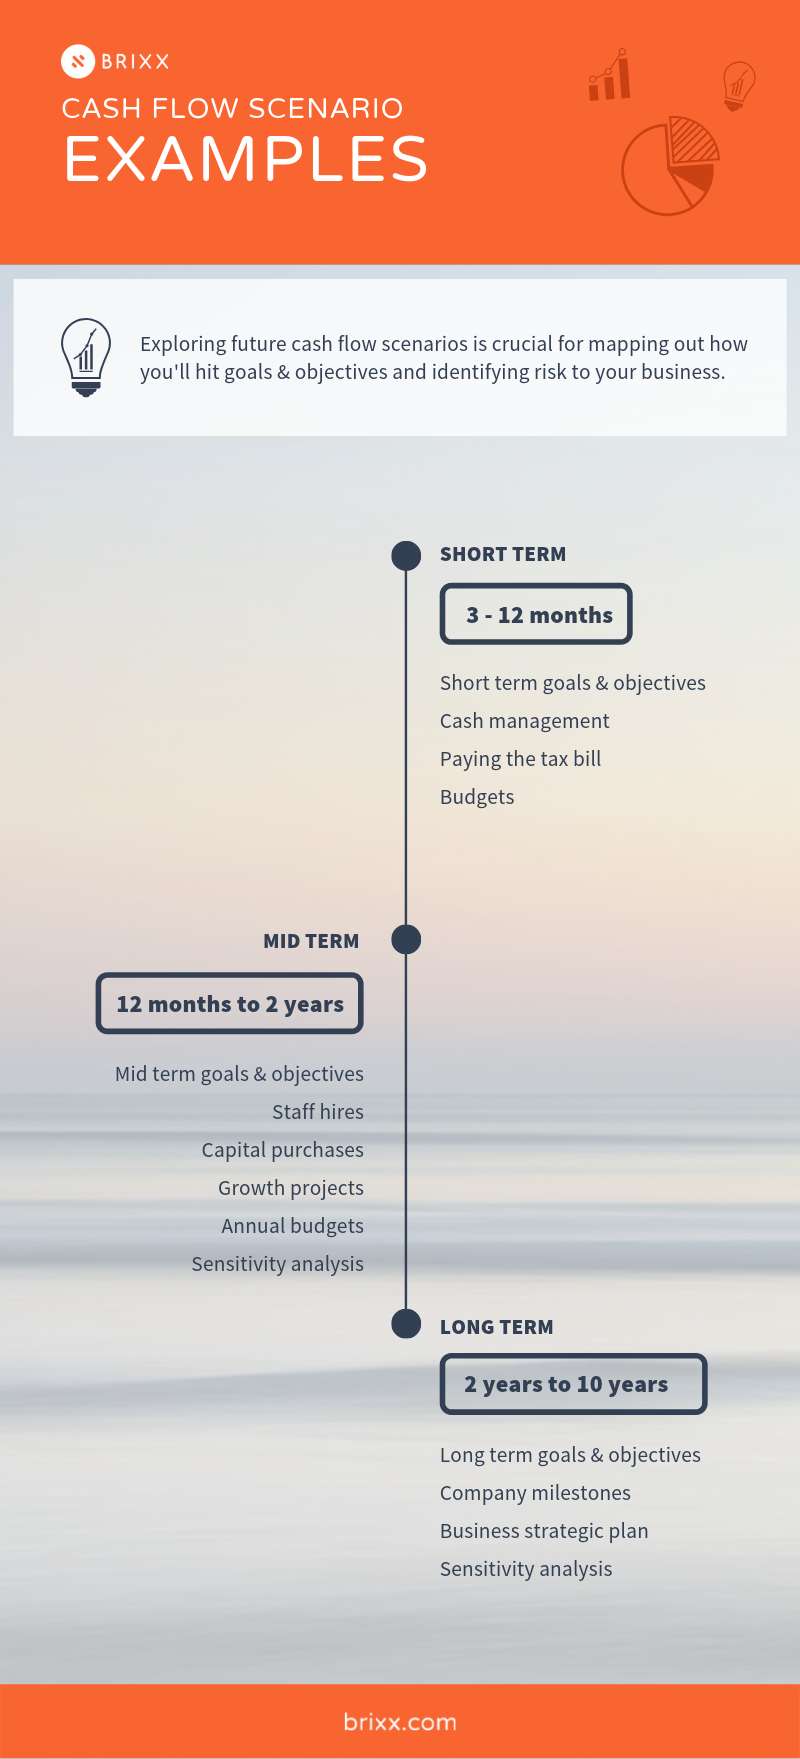 Cash flow forecast analysis scenario examples infographic